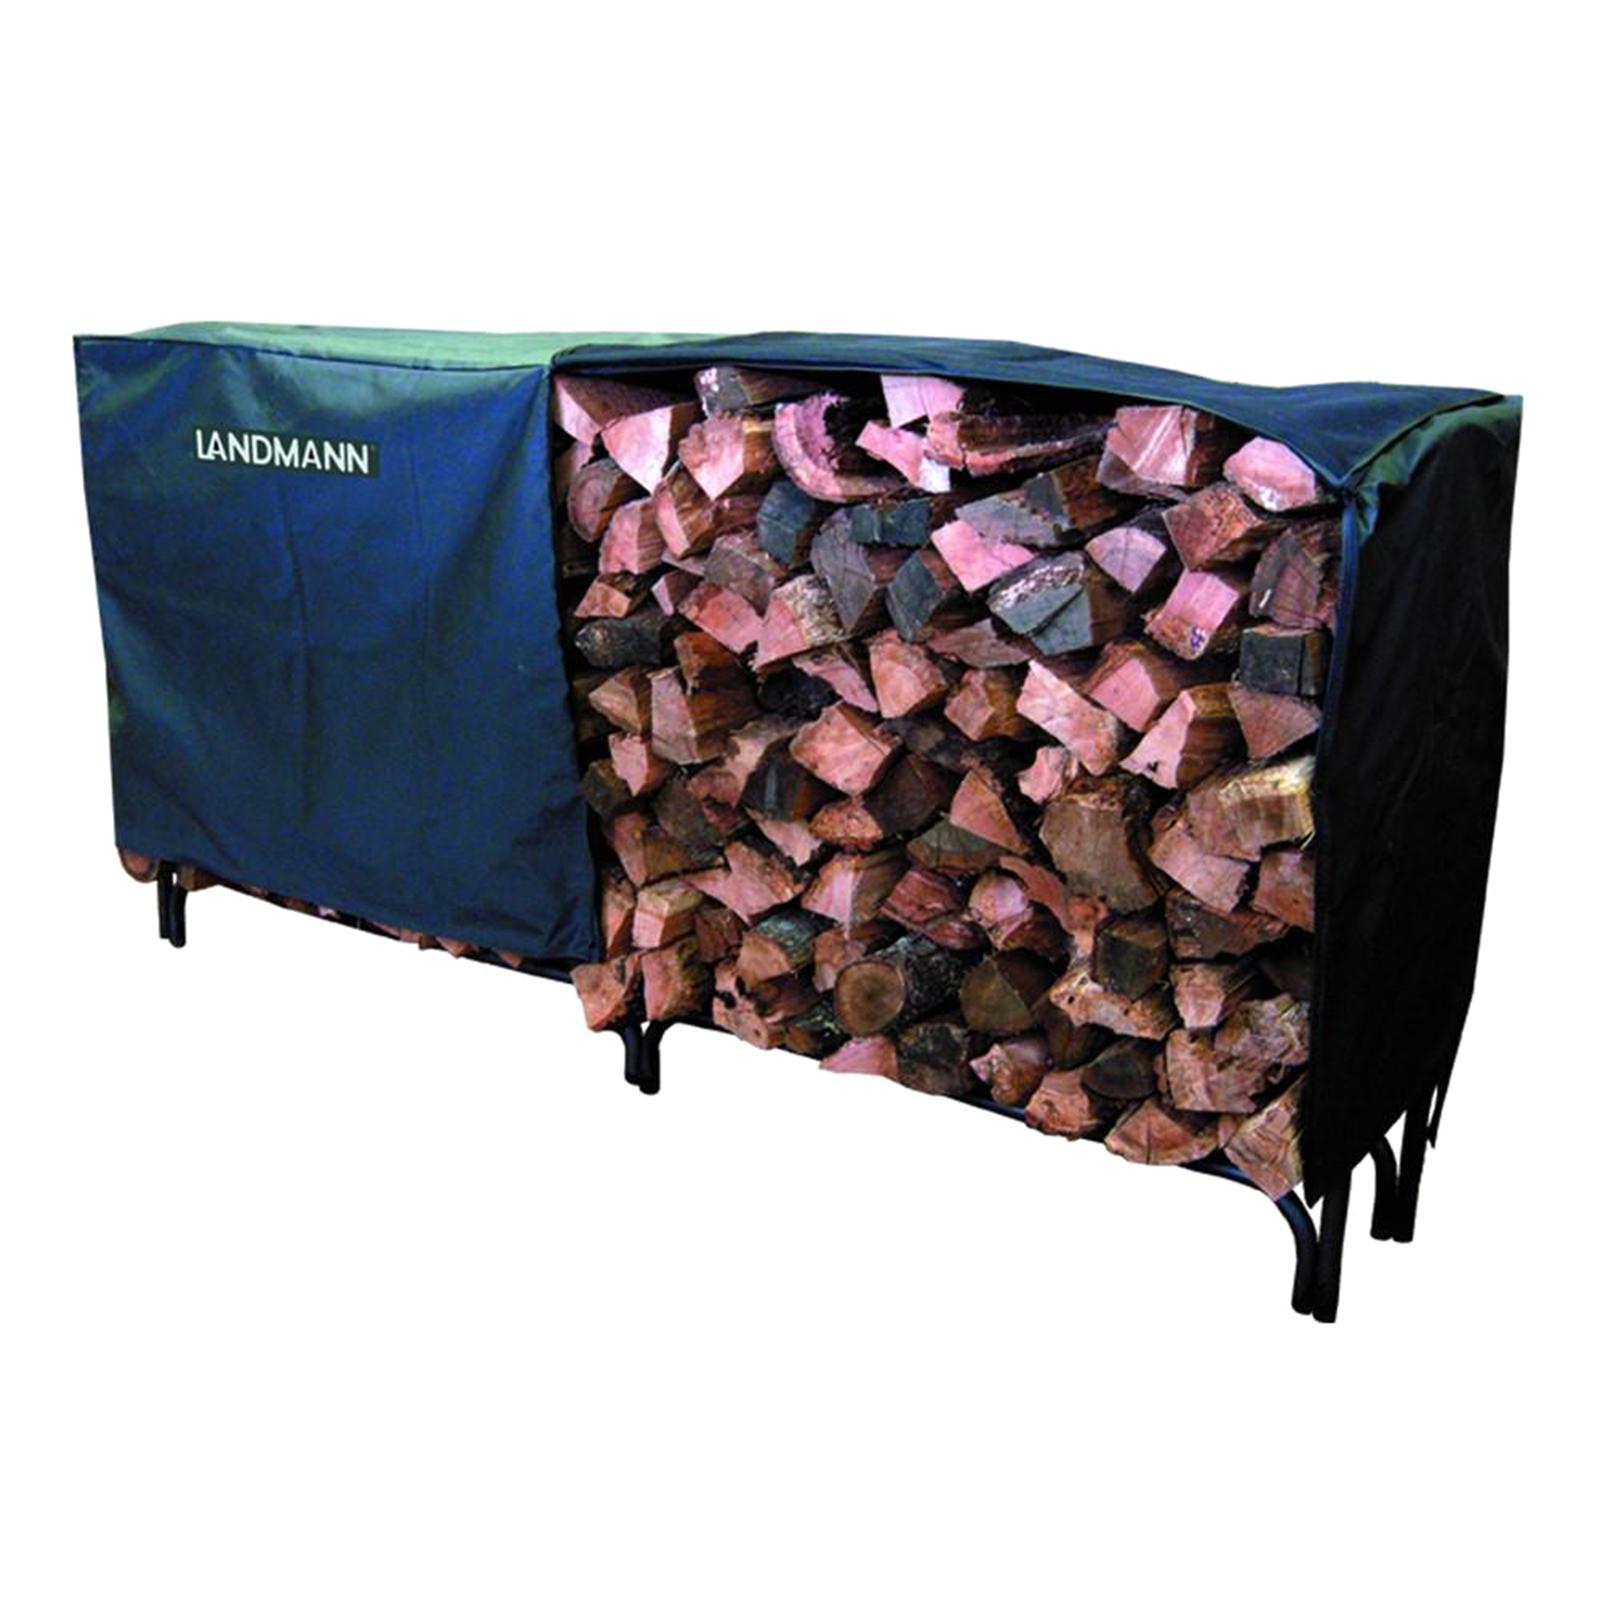 Landmann Heavy Duty Log Rack Cover - Sears Marketplace